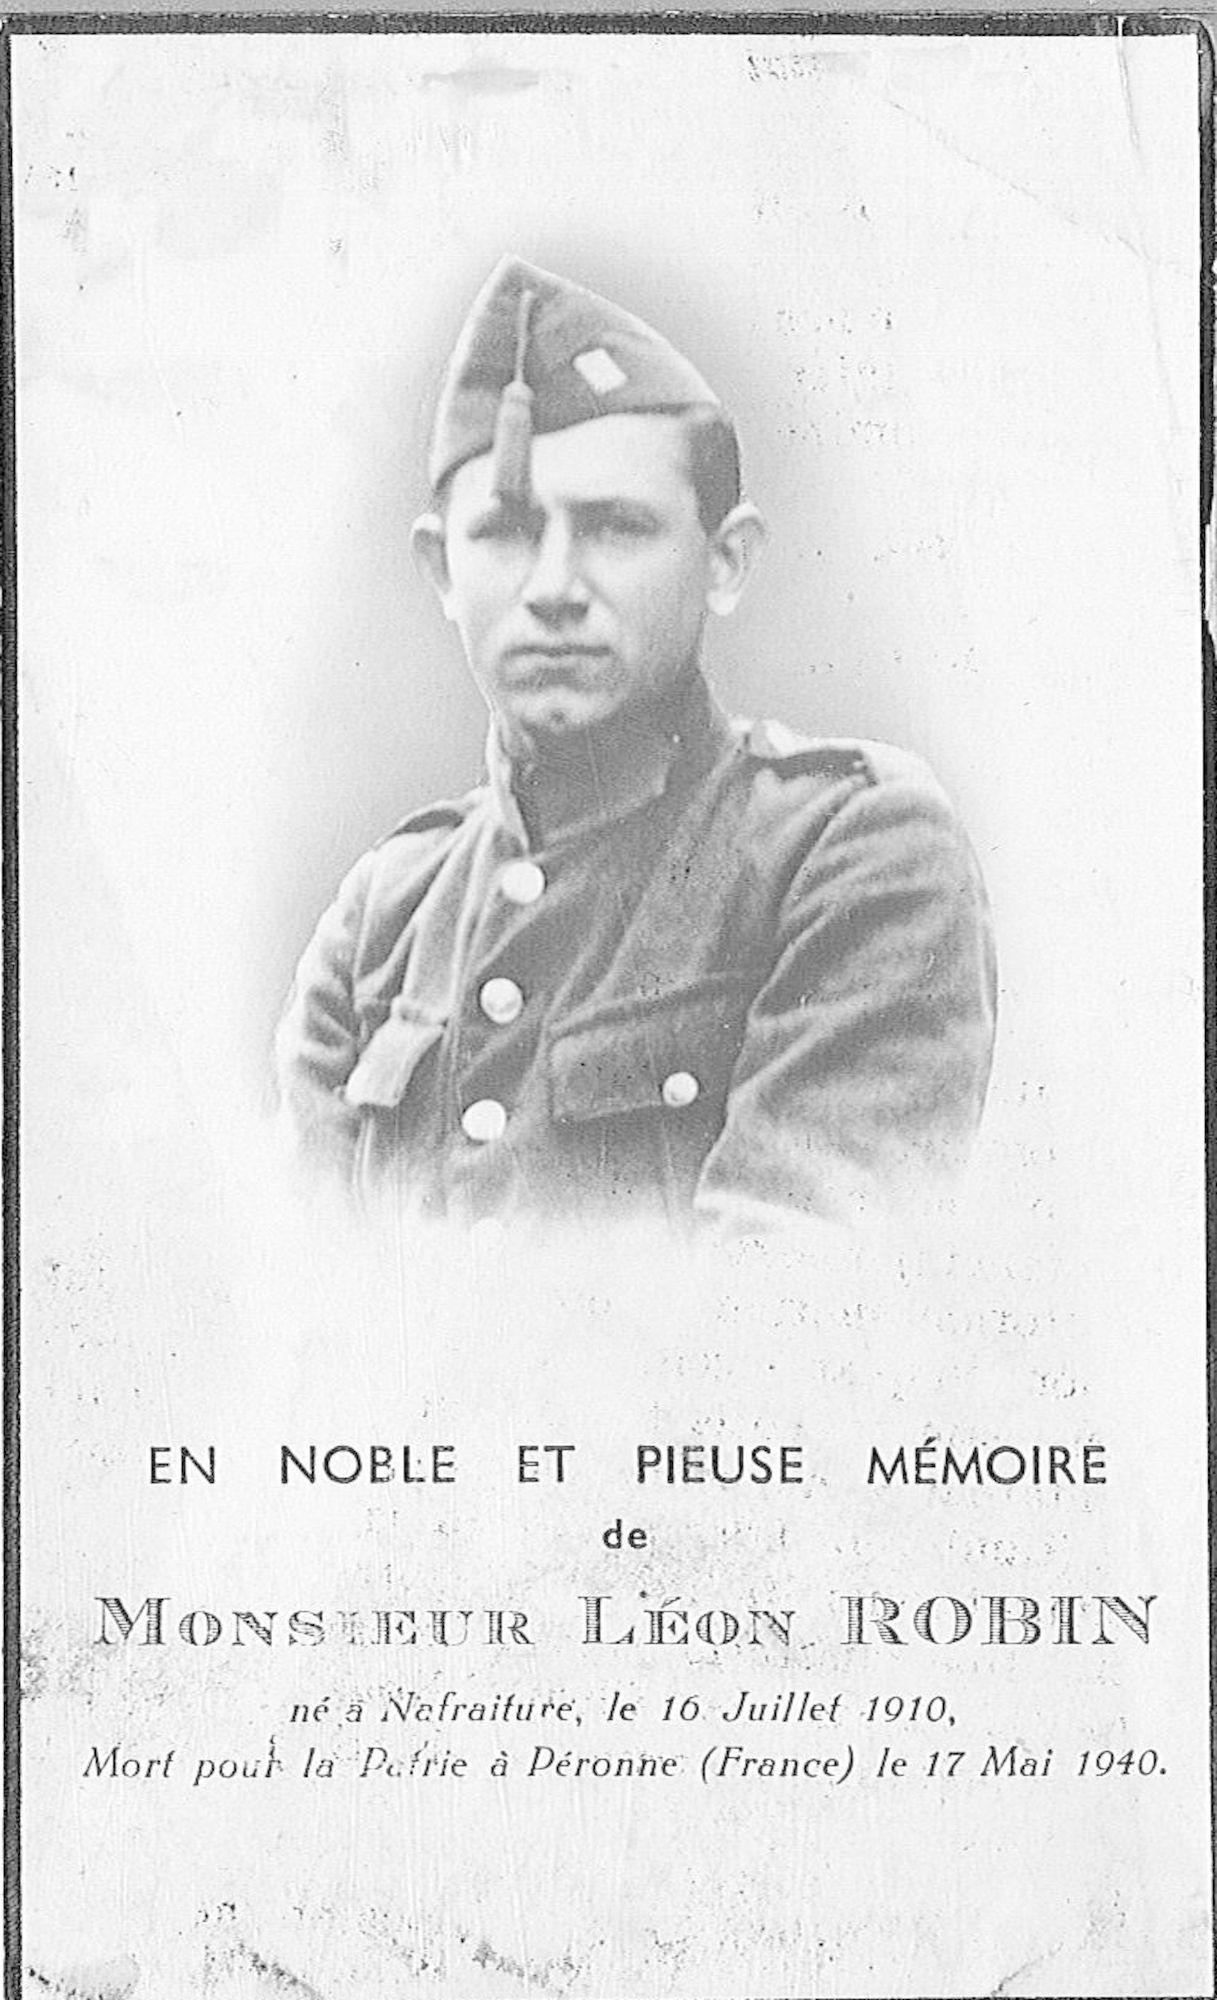 Léon Robin